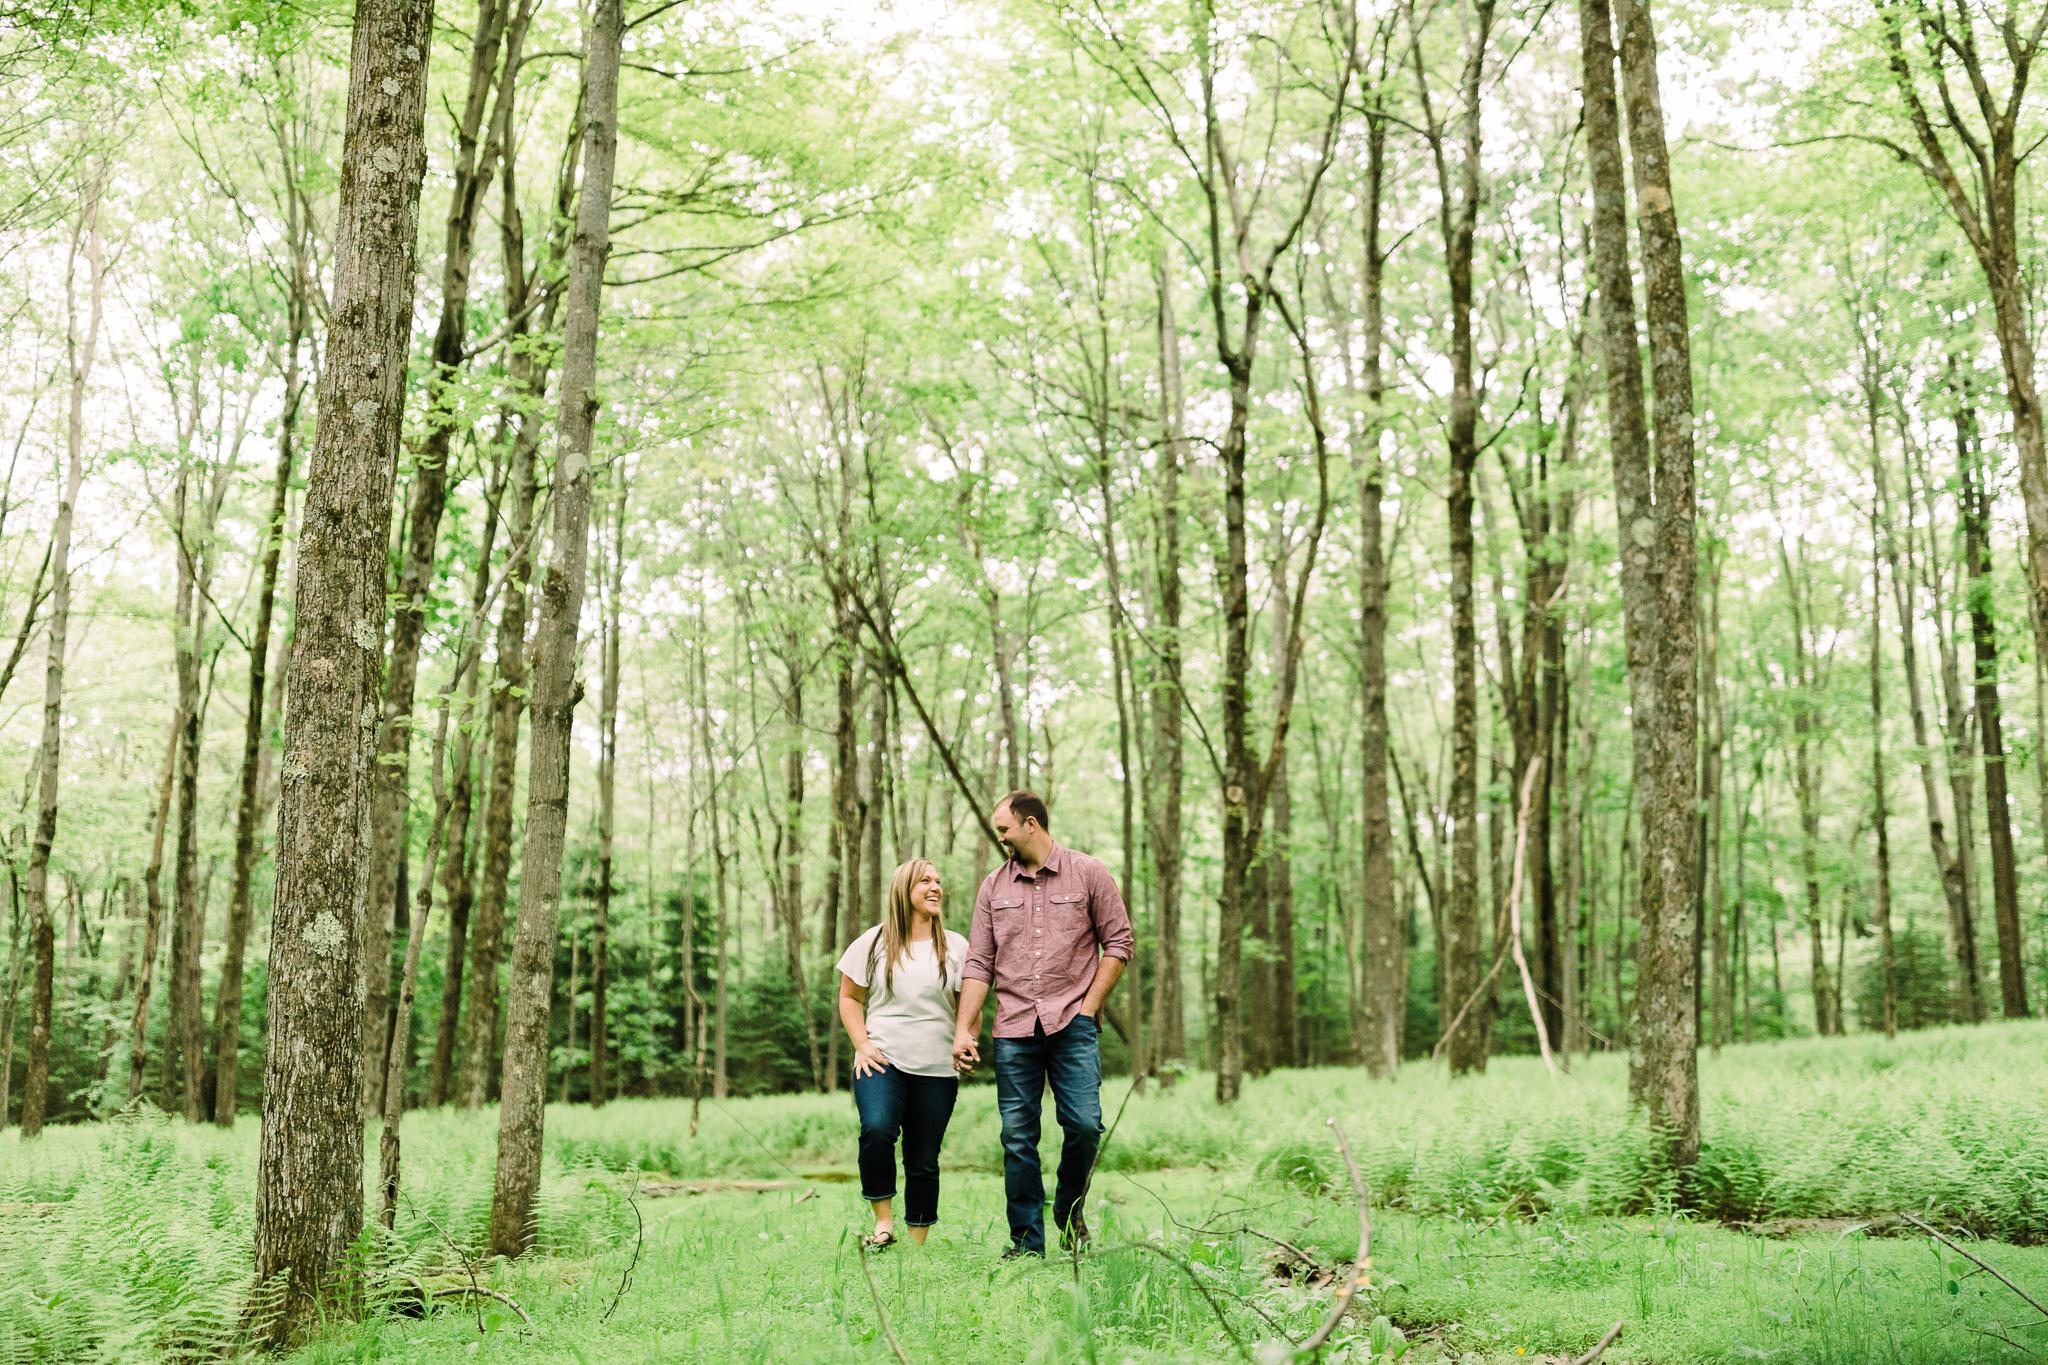 Kettle-creek-state-park-engagement-9778.jpg